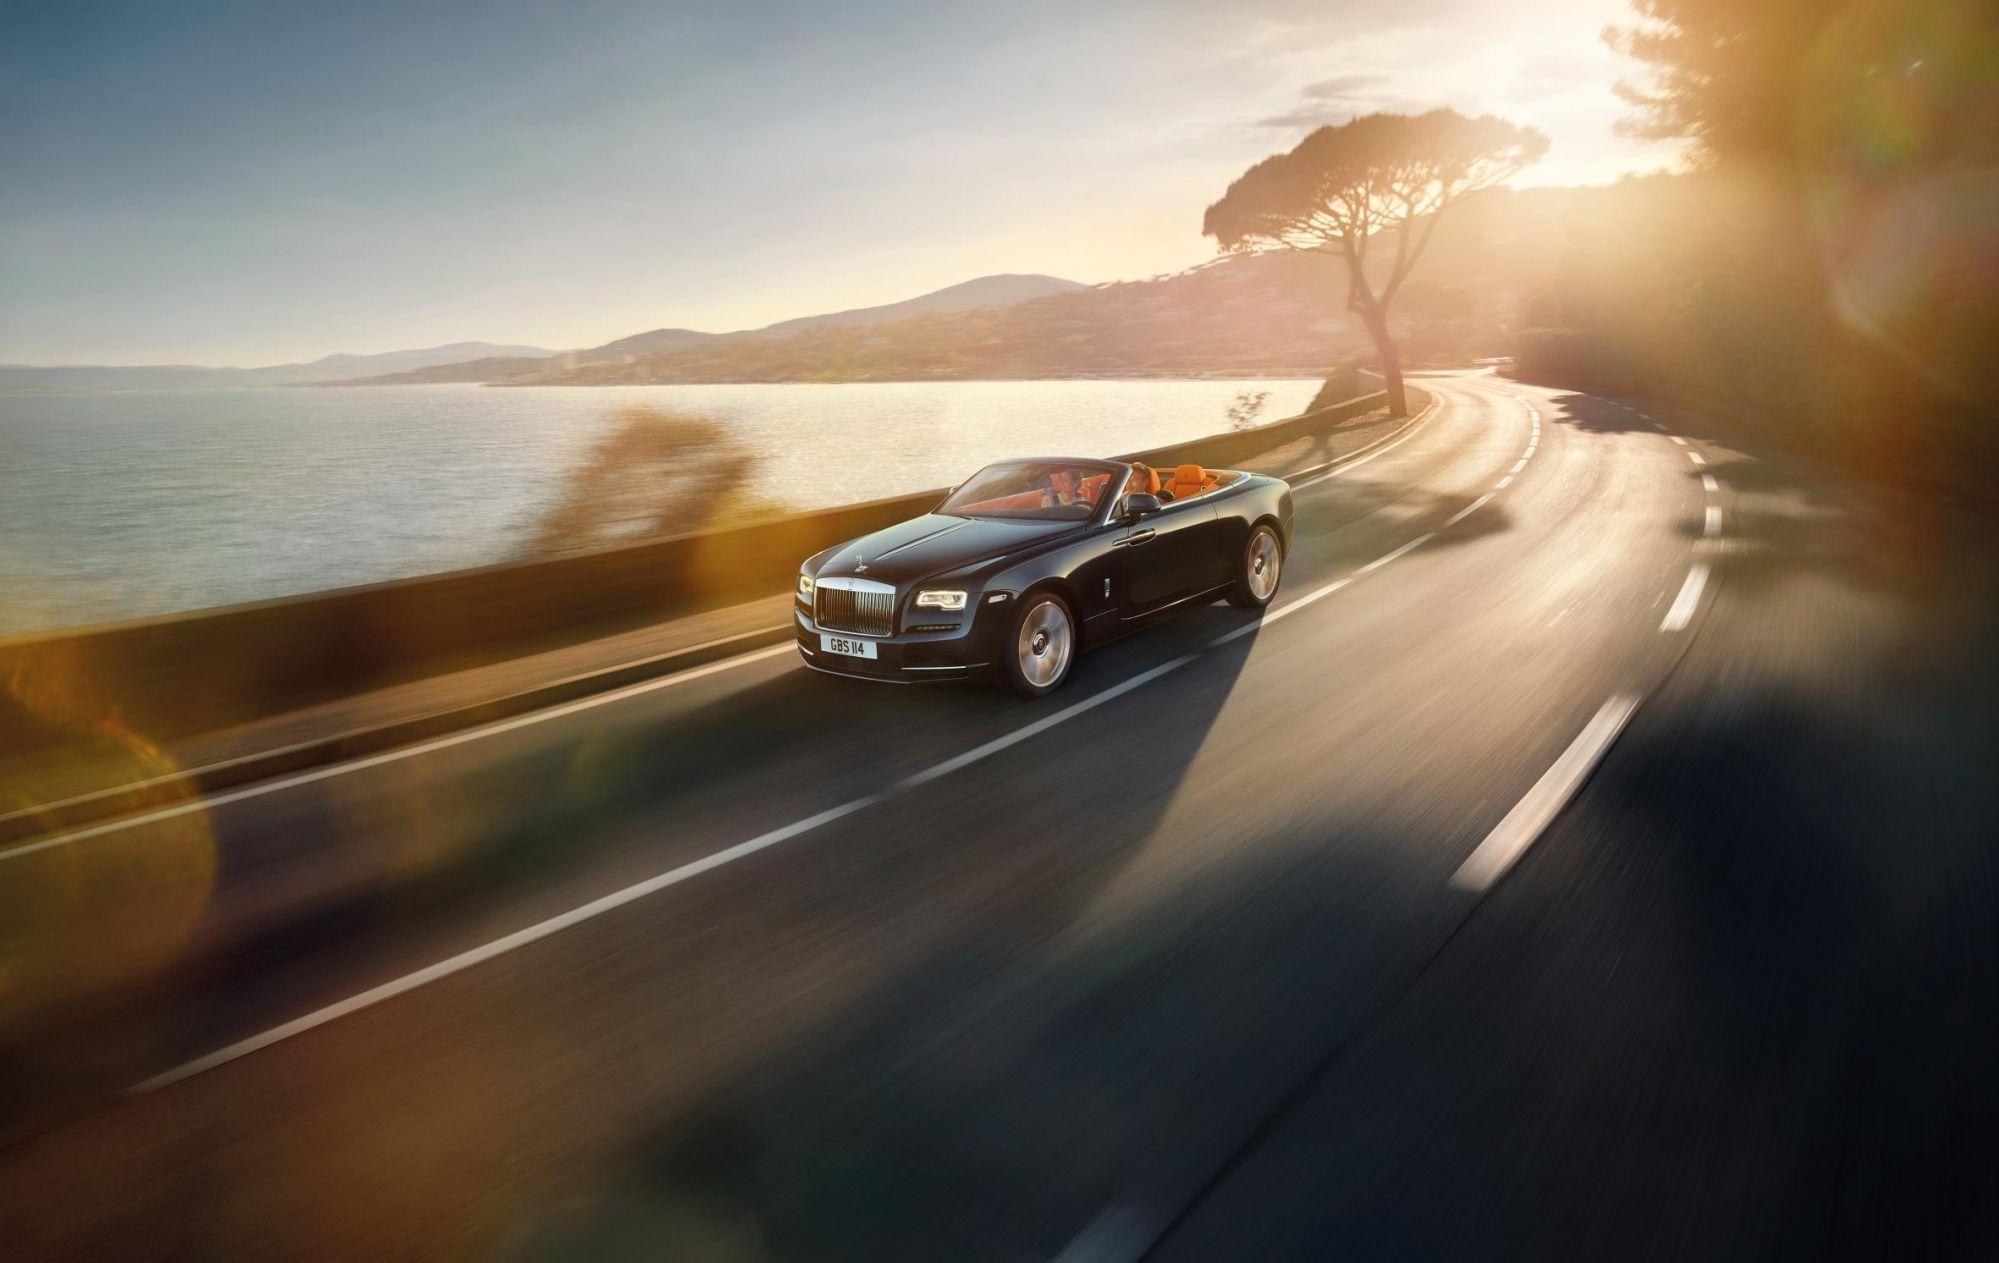 BMW Makes Record Sales